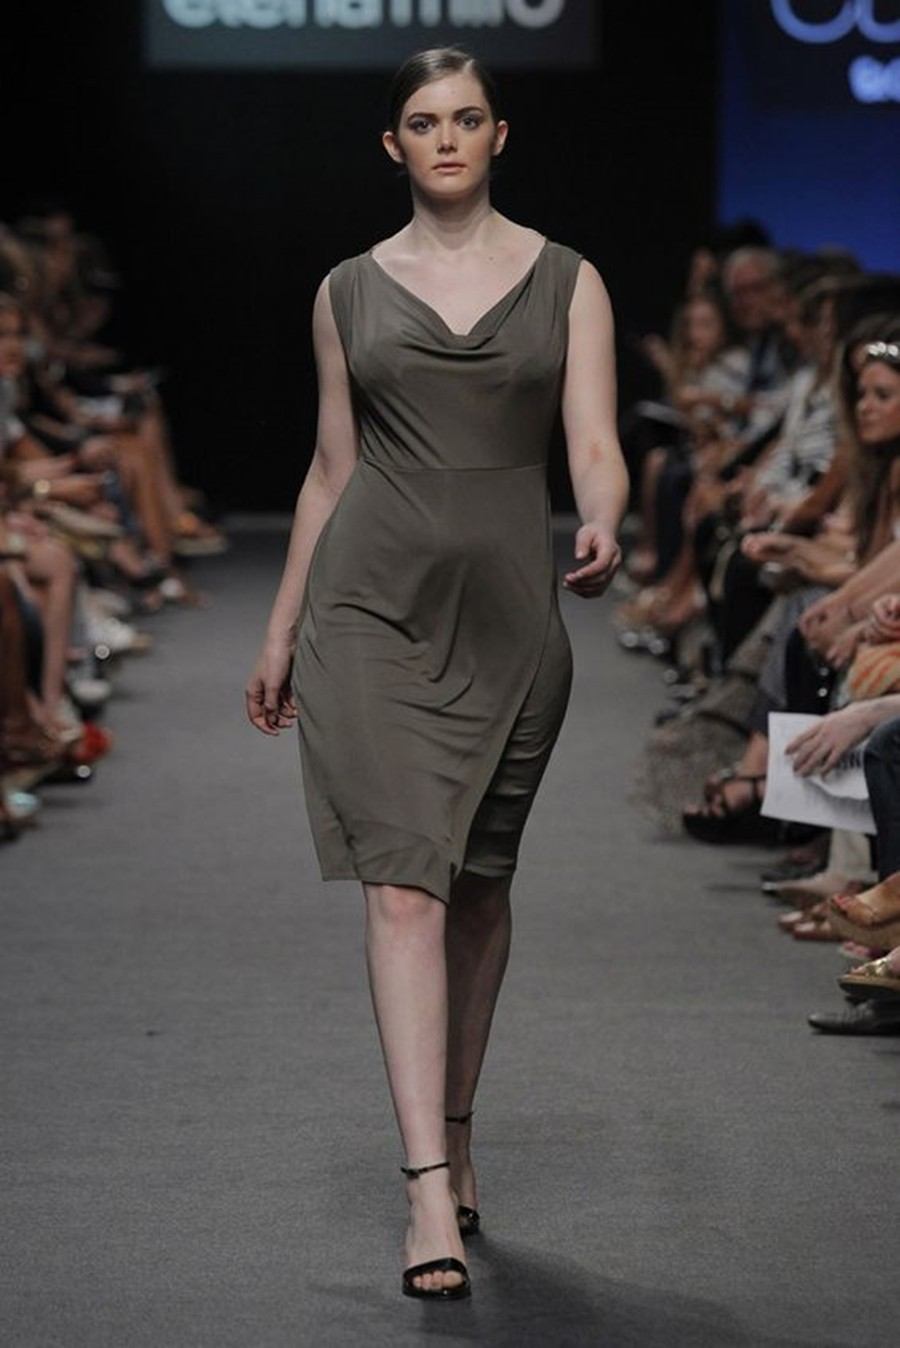 10-moda-curvy-vestido-reto